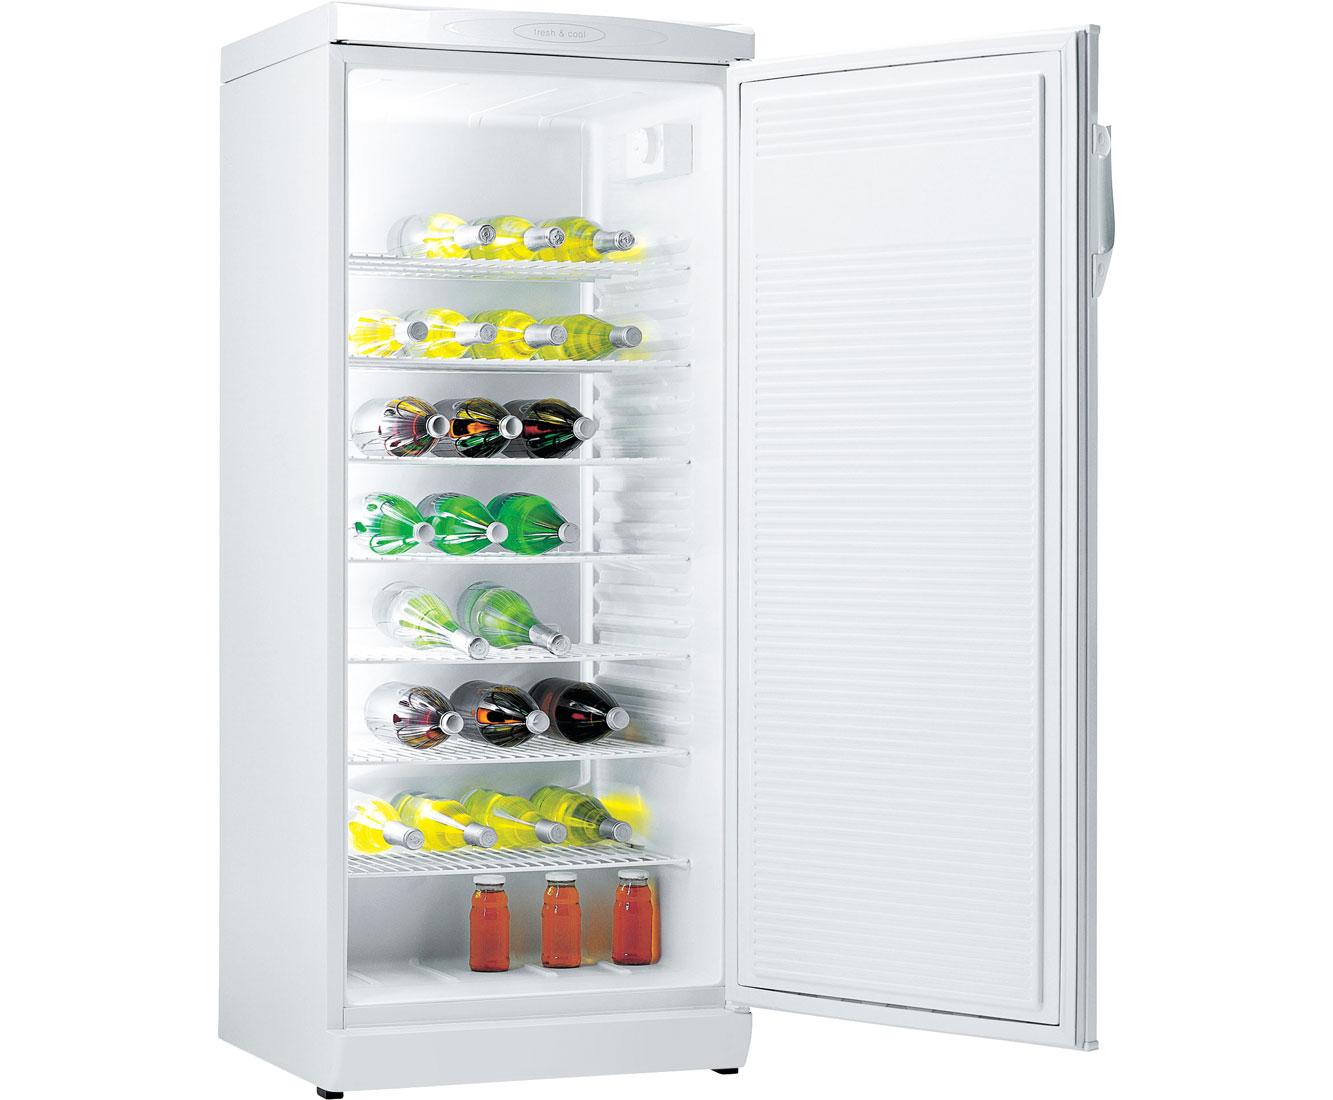 Gorenje Kühlschrank Qualität : Gorenje rvc w kühlschrank weiß a